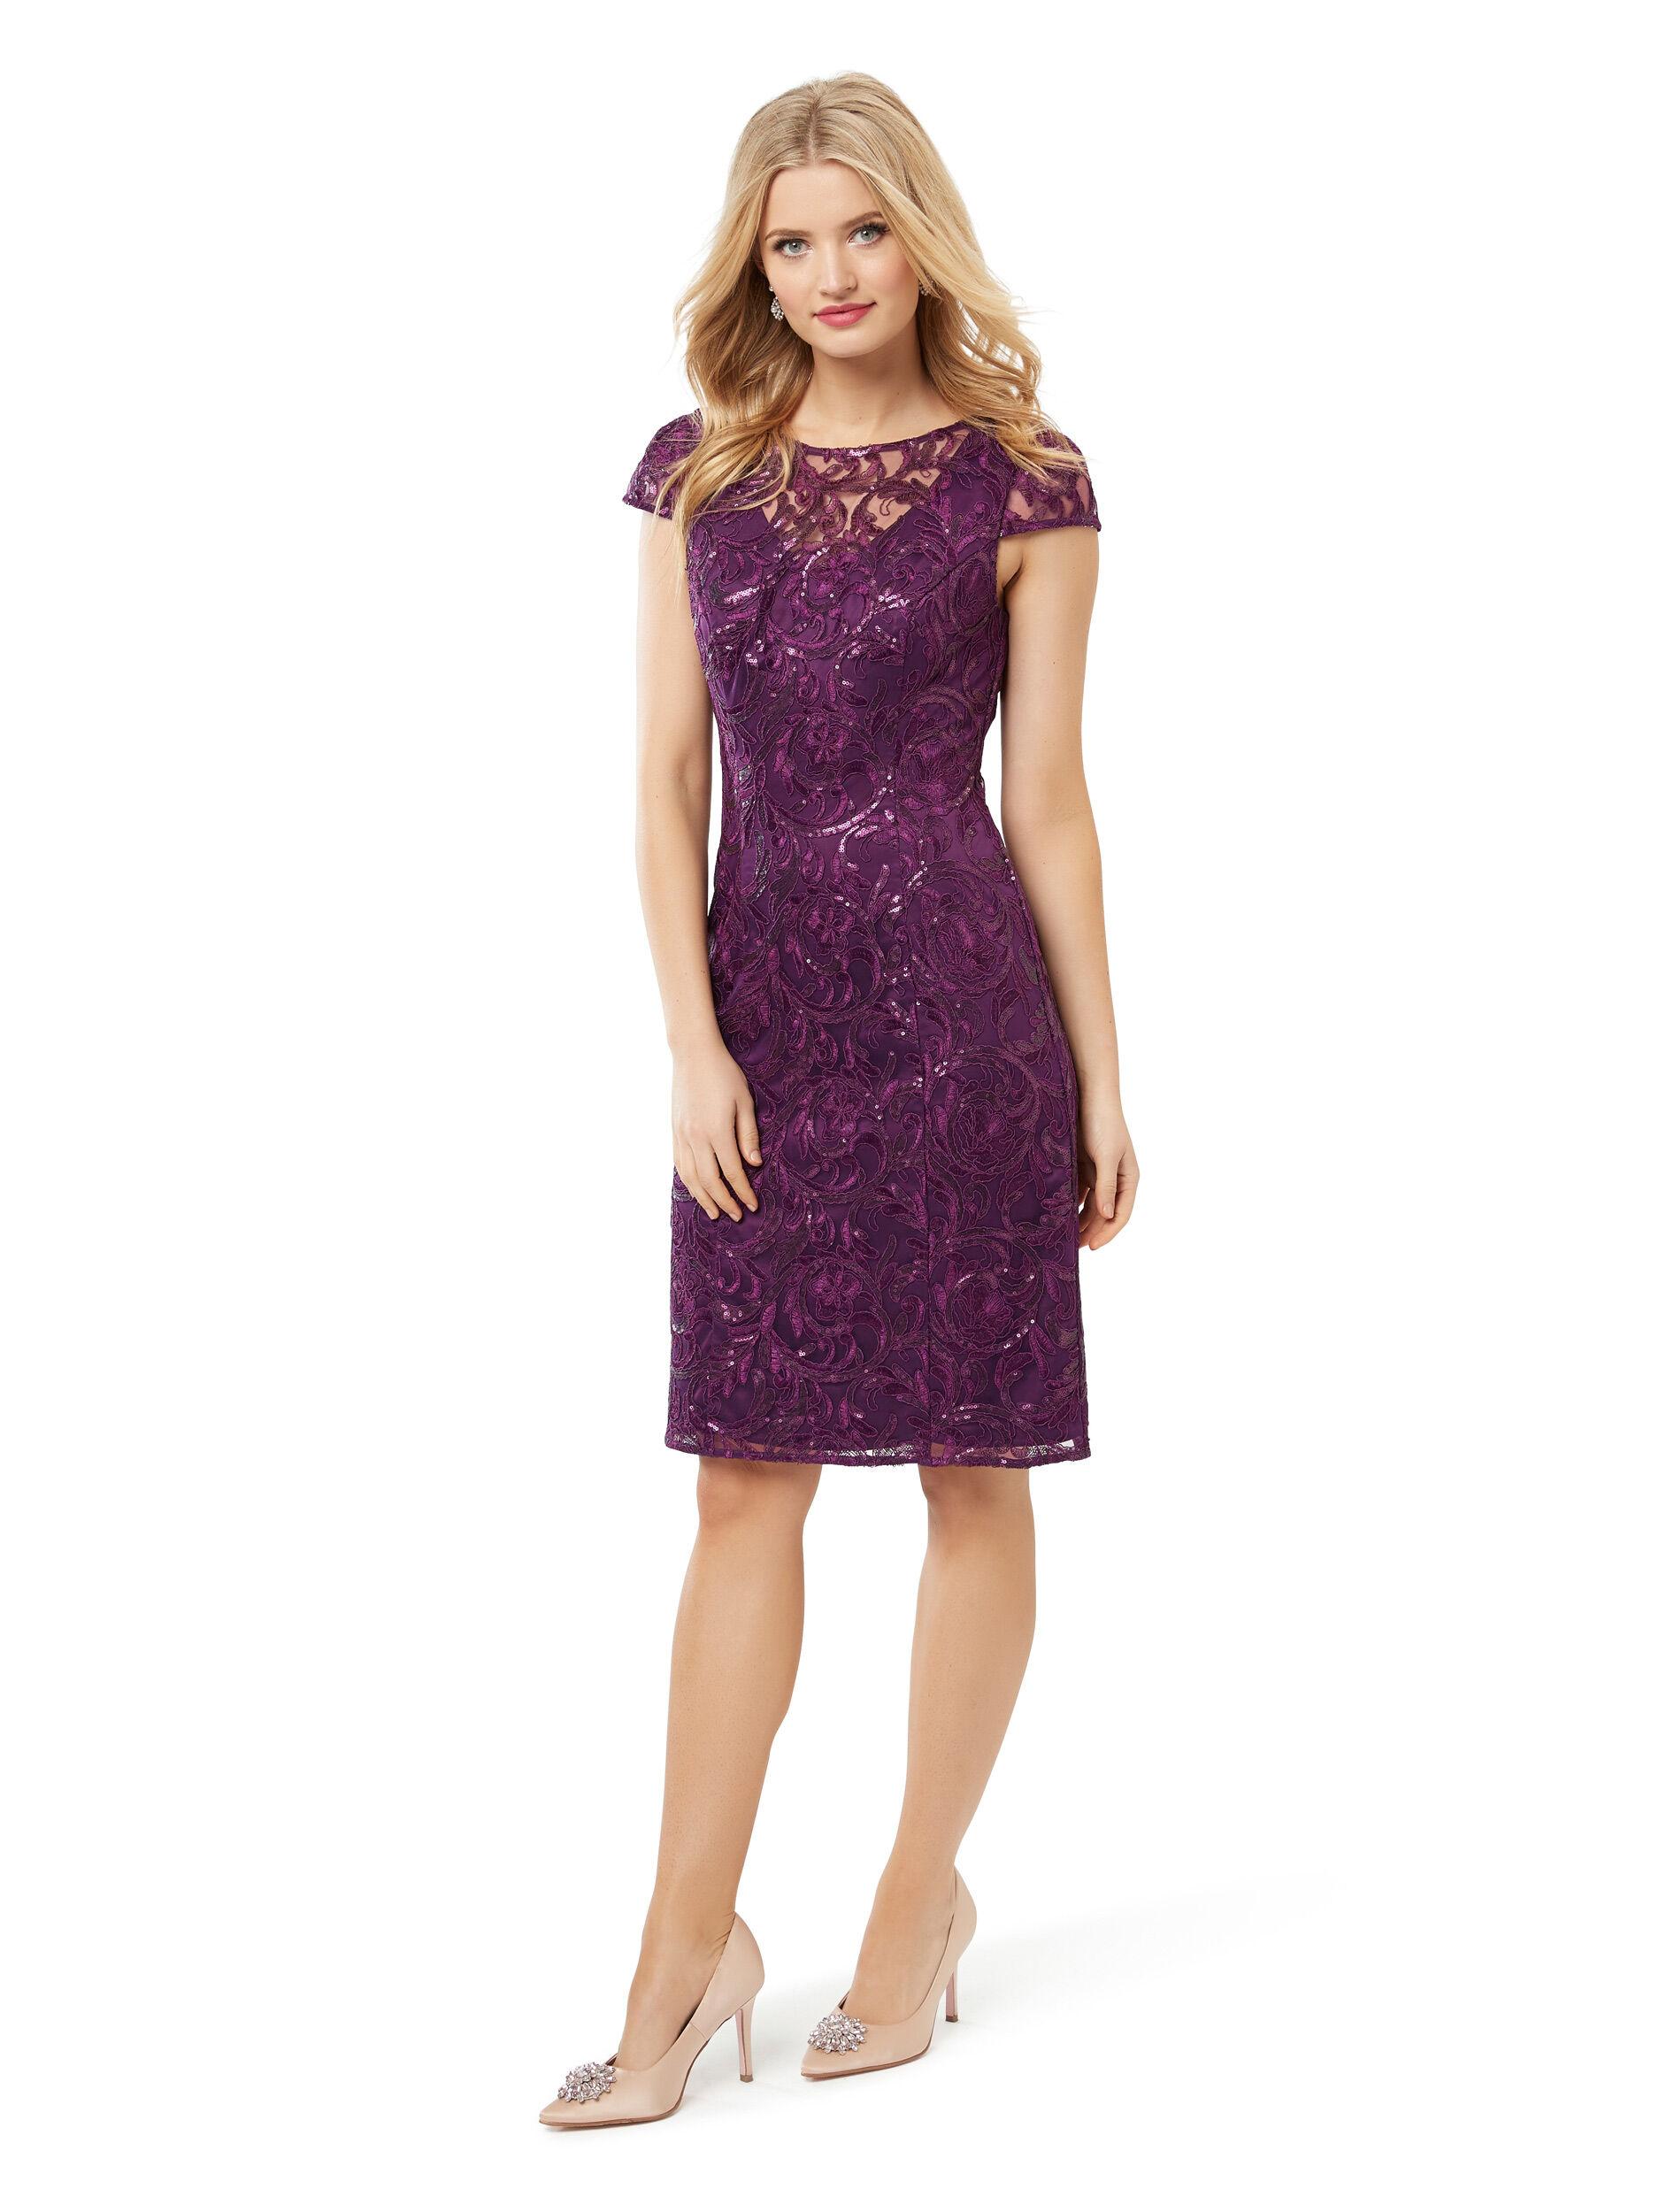 Time For Shimmer Slv Dress